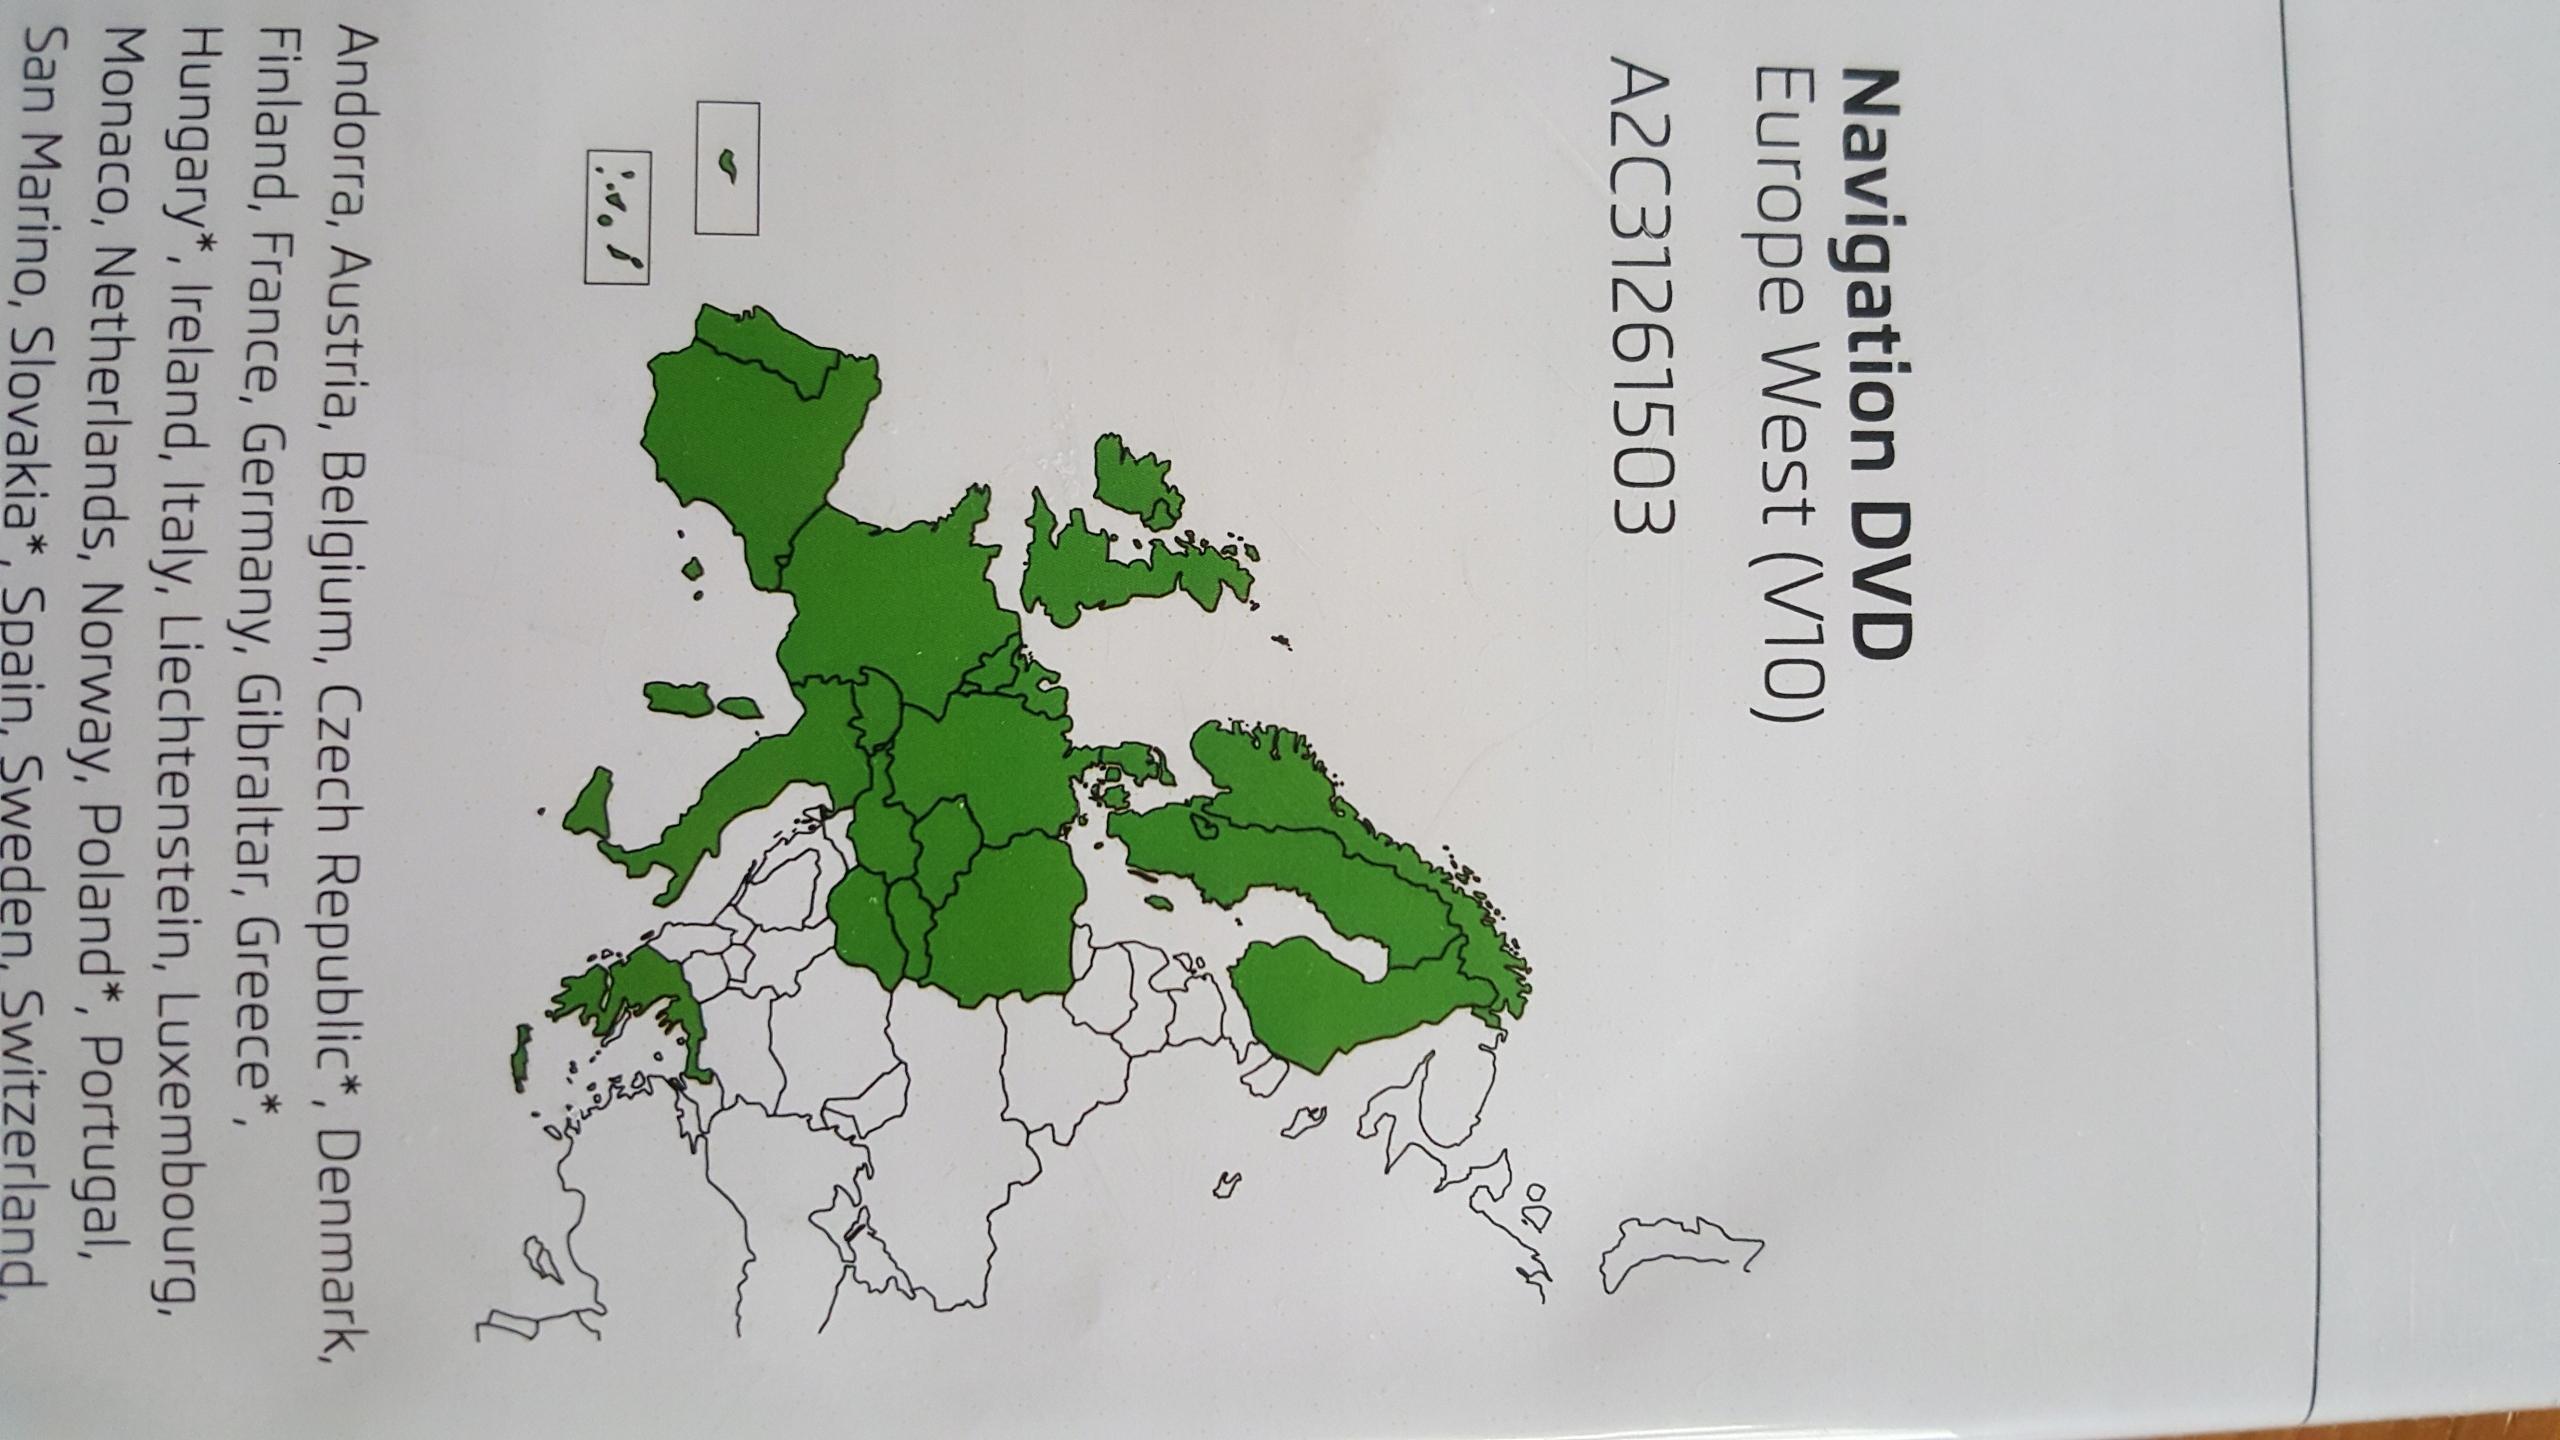 MAPY EUROPA VW SKODA ITP/ V10 - 7682642906 - oficjalne